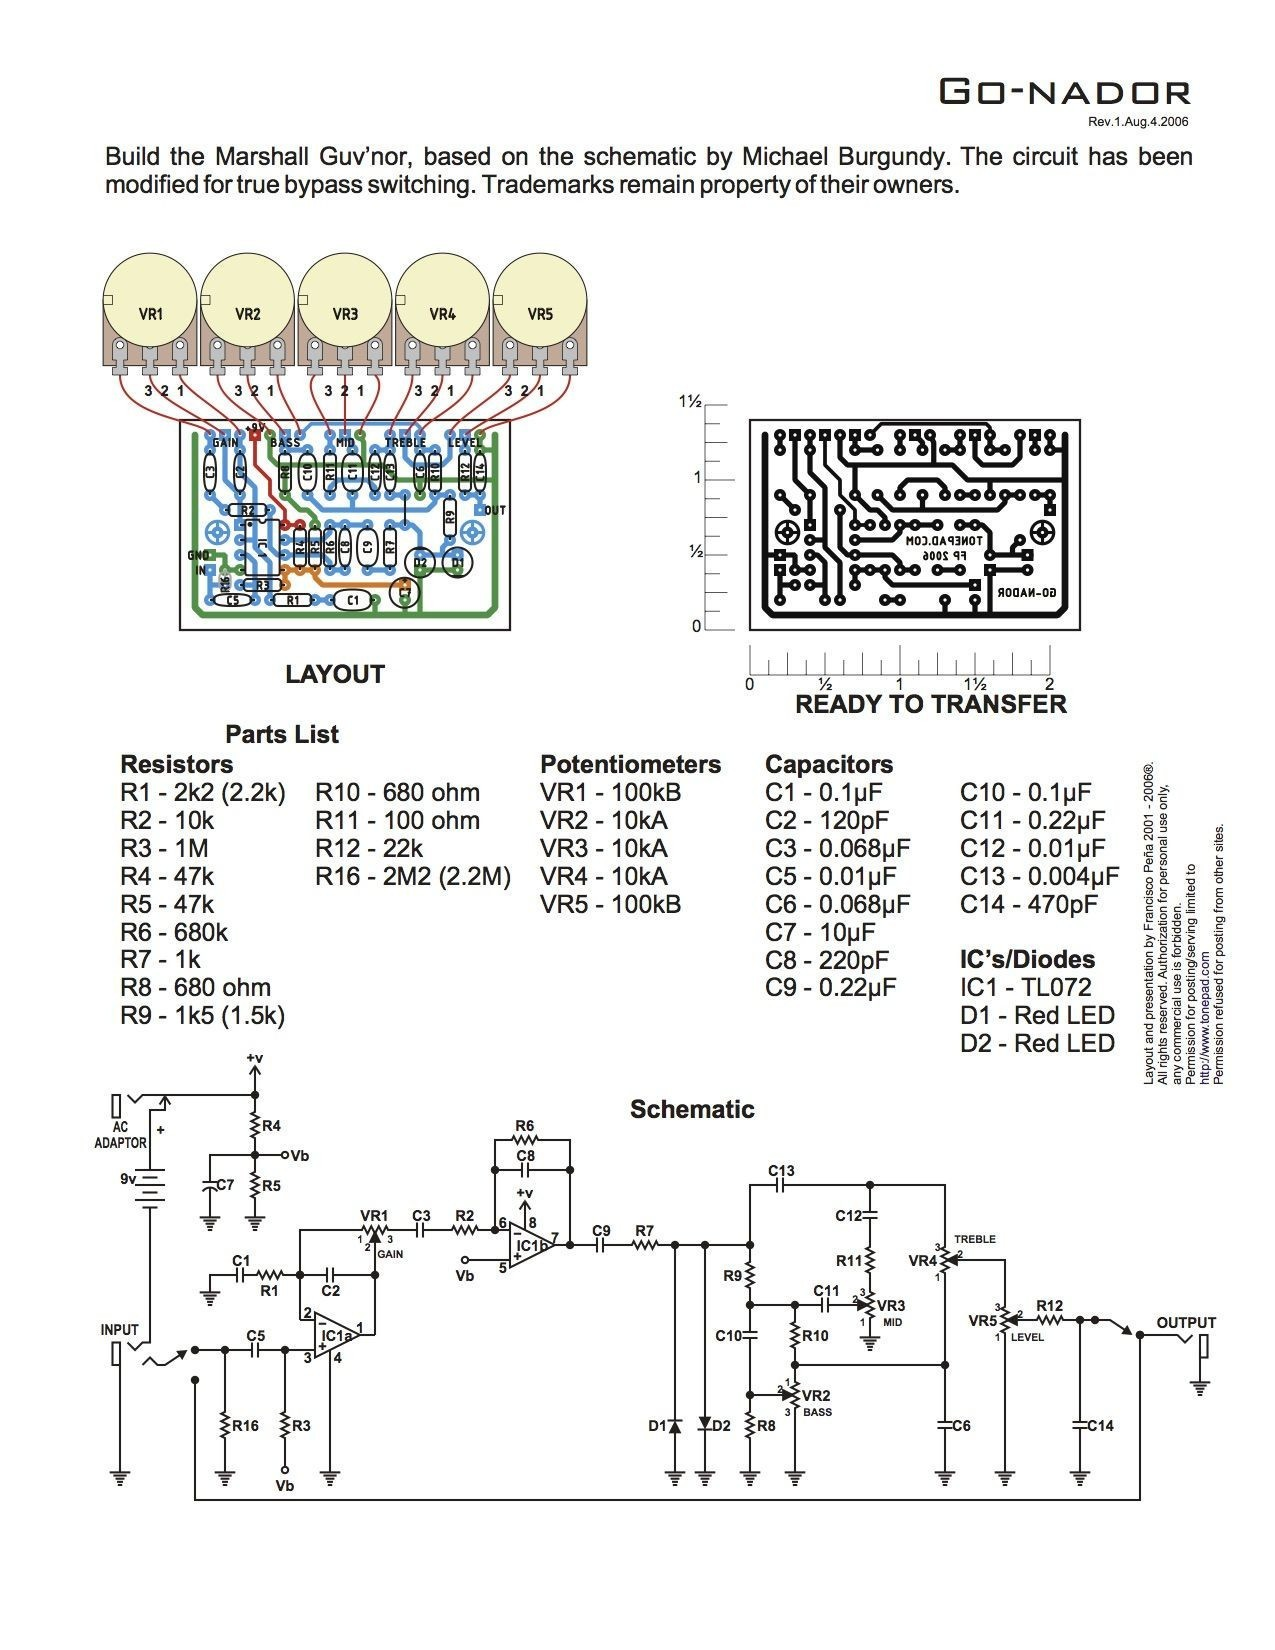 Kill Switch Wiring Diagram Car Ignition Kill Switch Wiring Diagram Fresh Wiring Diagram for A Of Kill Switch Wiring Diagram Car